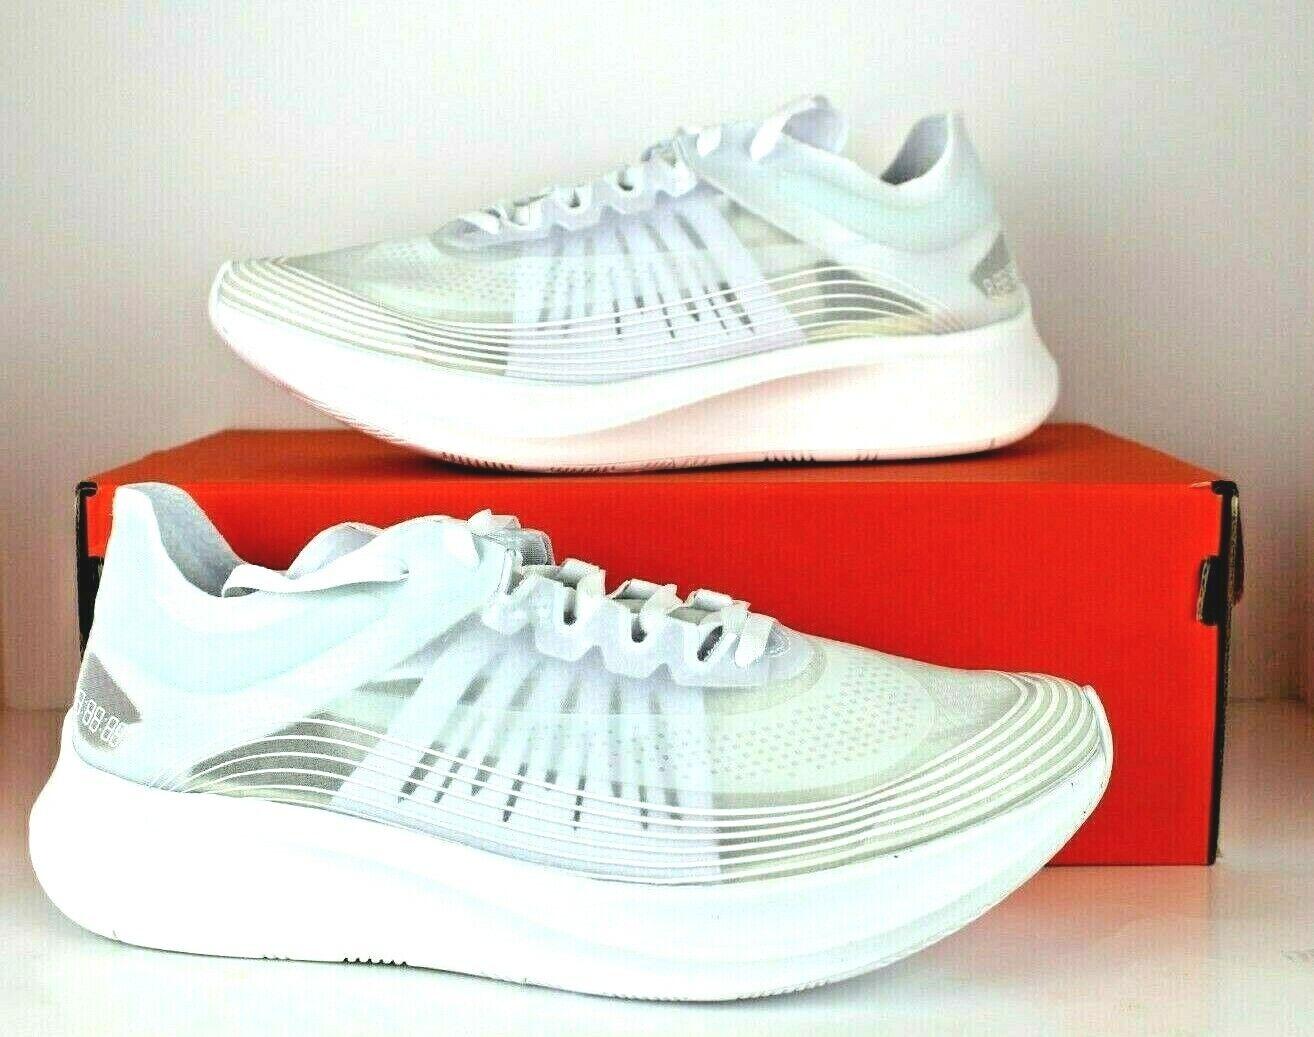 NIKE ZOOM FLY SP NA Men's Running shoes BQ7024 100 White White-Summit White NIB